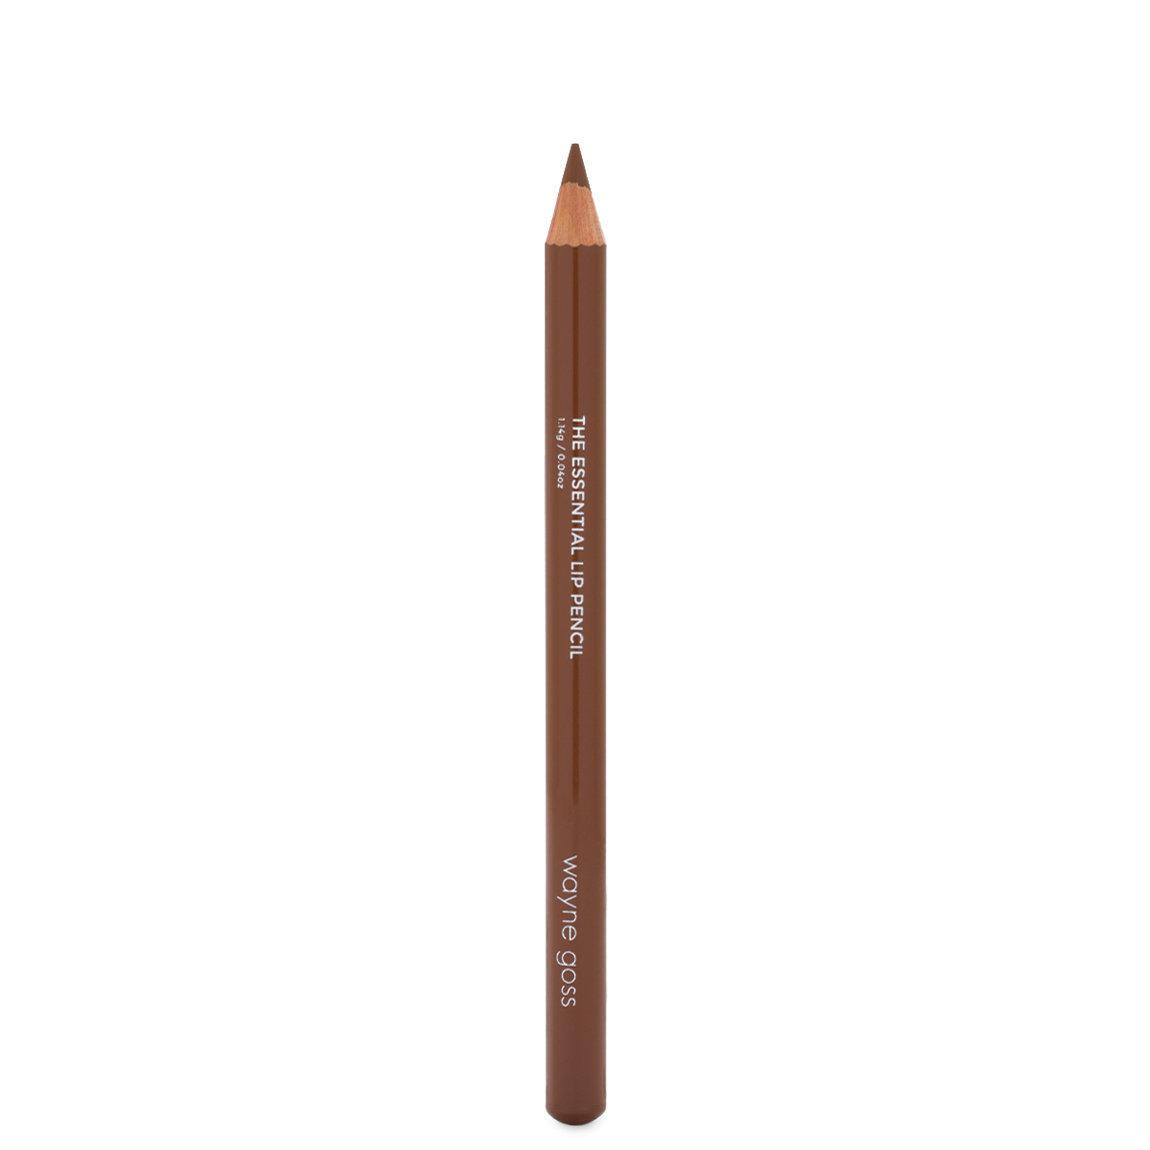 Wayne Goss The Essential Lip Pencil Deep Nude alternative view 1.